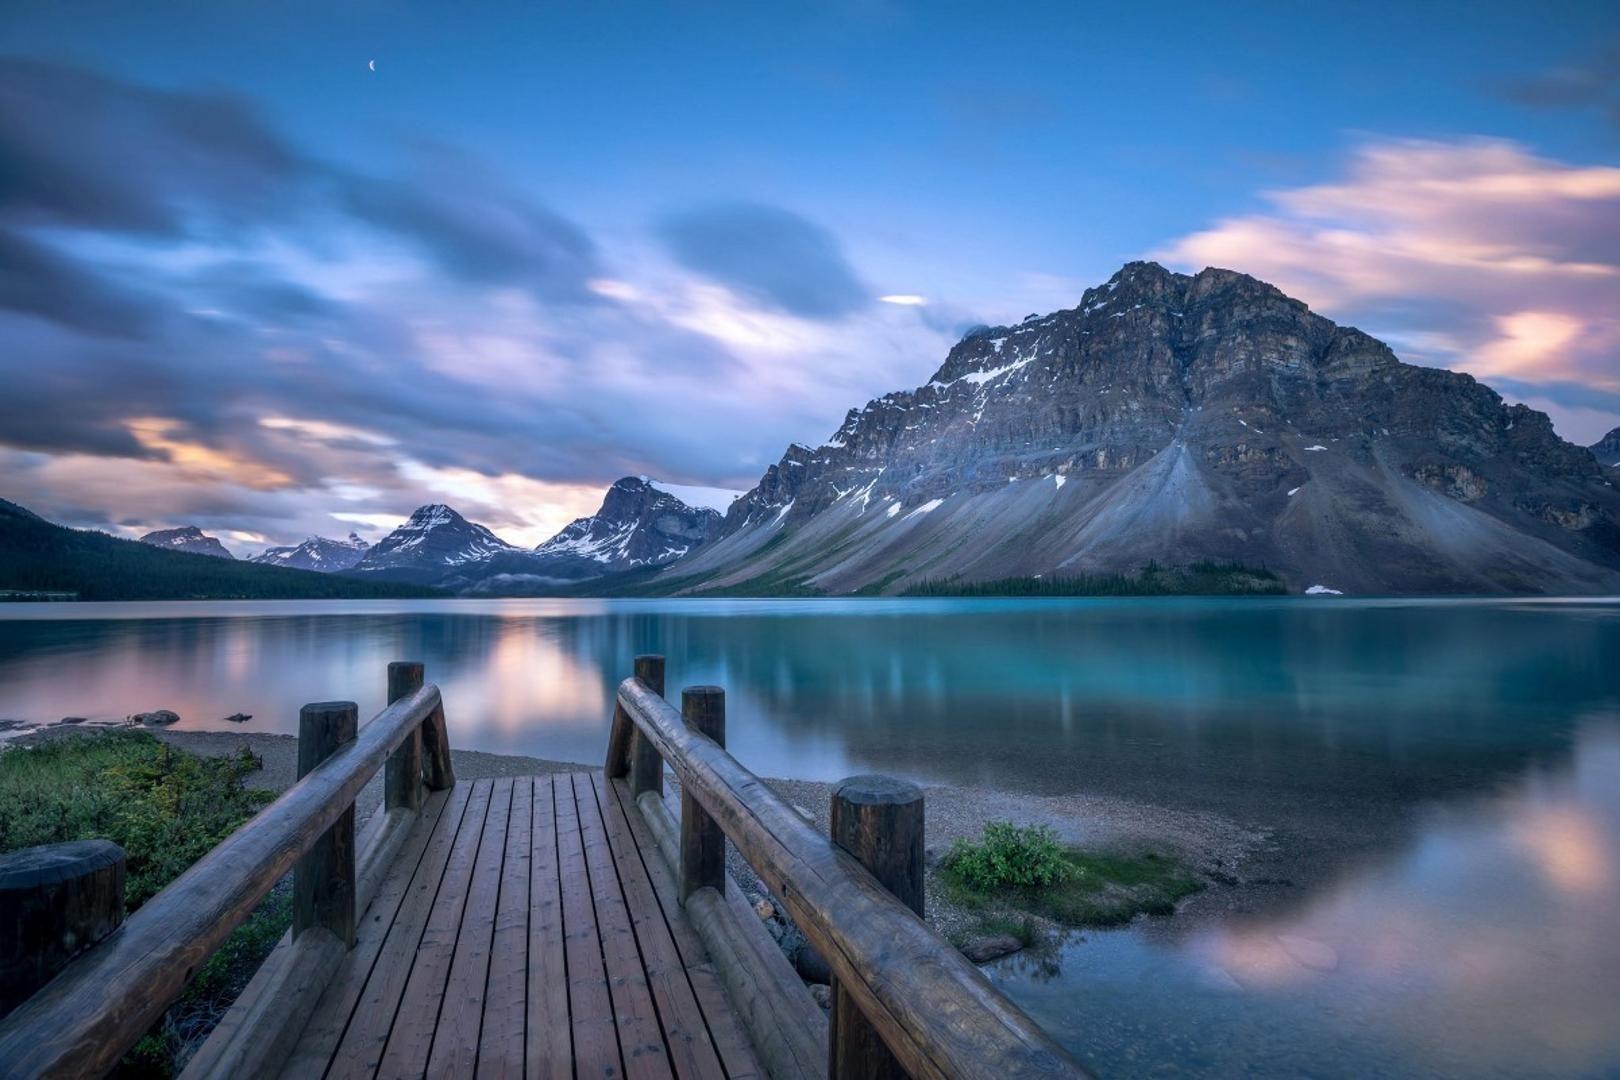 2019 Canada Bow Lake Beautiful Nature Scenic Living Room